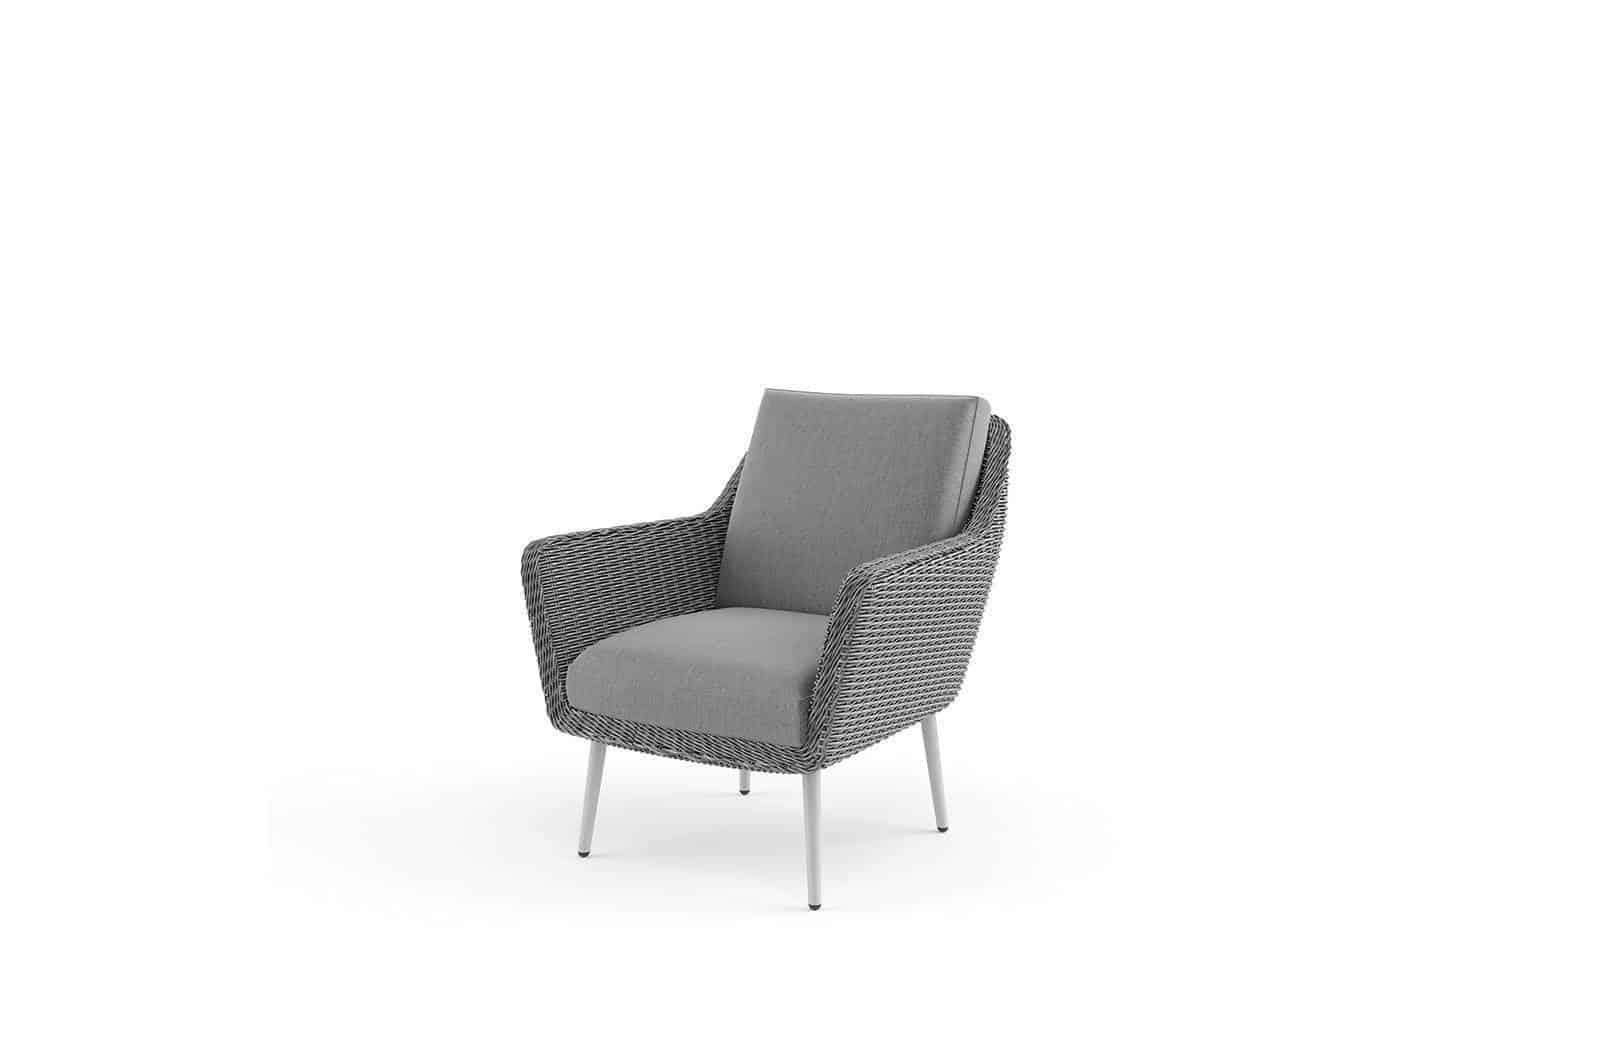 Fotel ogrodowy MONZA  IMOLA royal grey